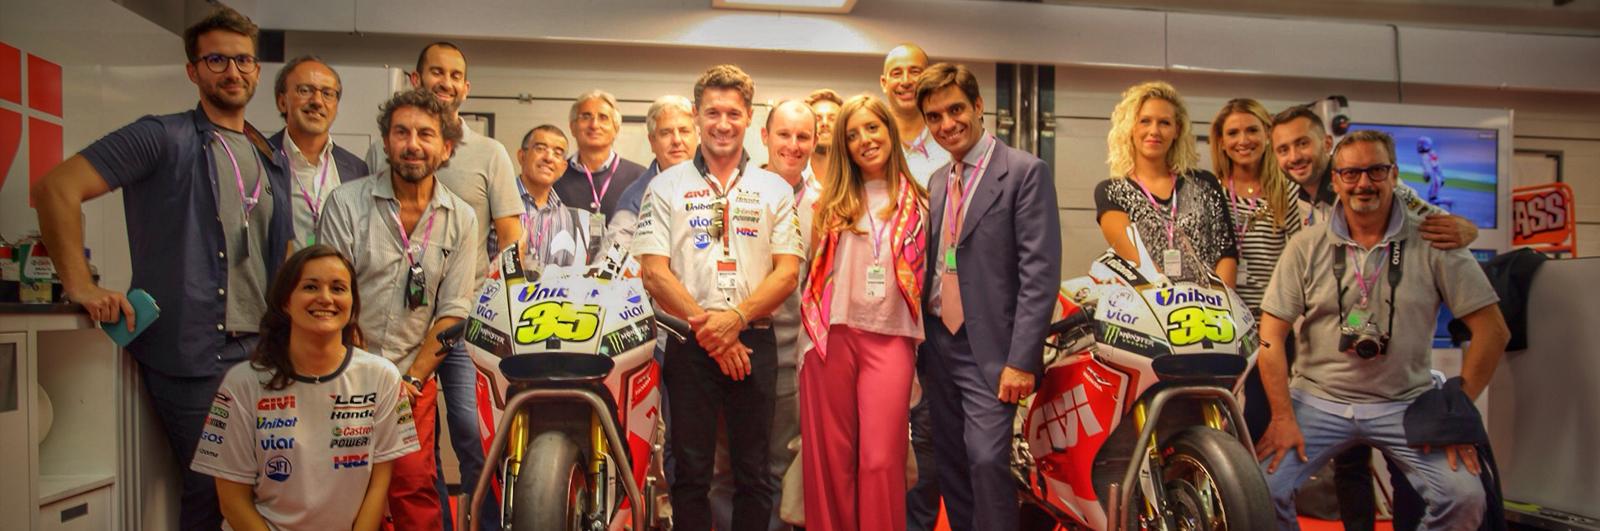 Hospitality: SIFI at MotoGP San Marino e Riviera di Rimini 2015